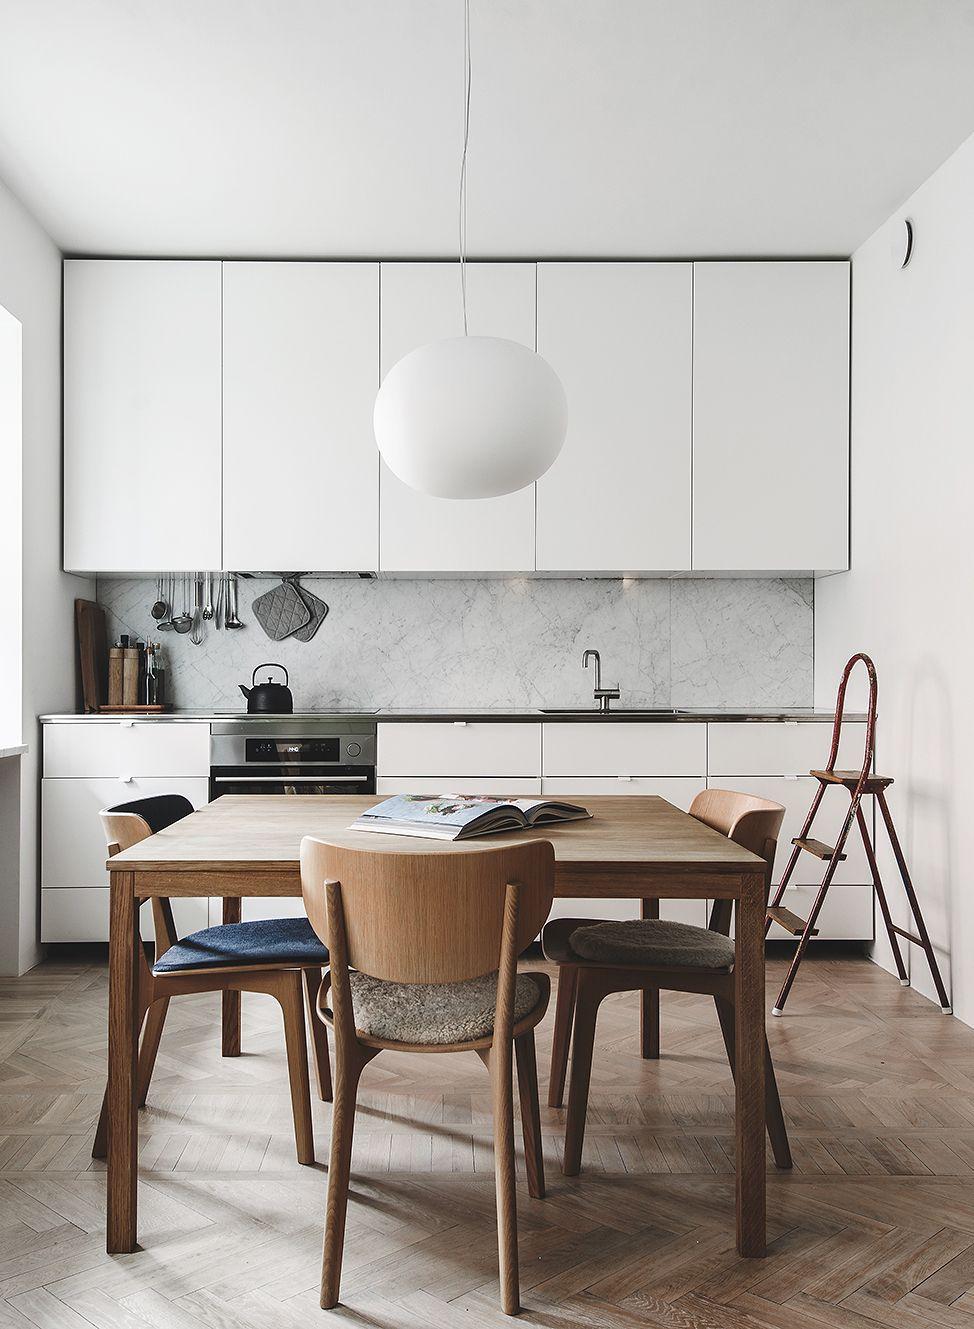 Kitchen In A Natural Look  Via Coco Lapine Design Blog Enchanting Kitchen Design Blog Inspiration